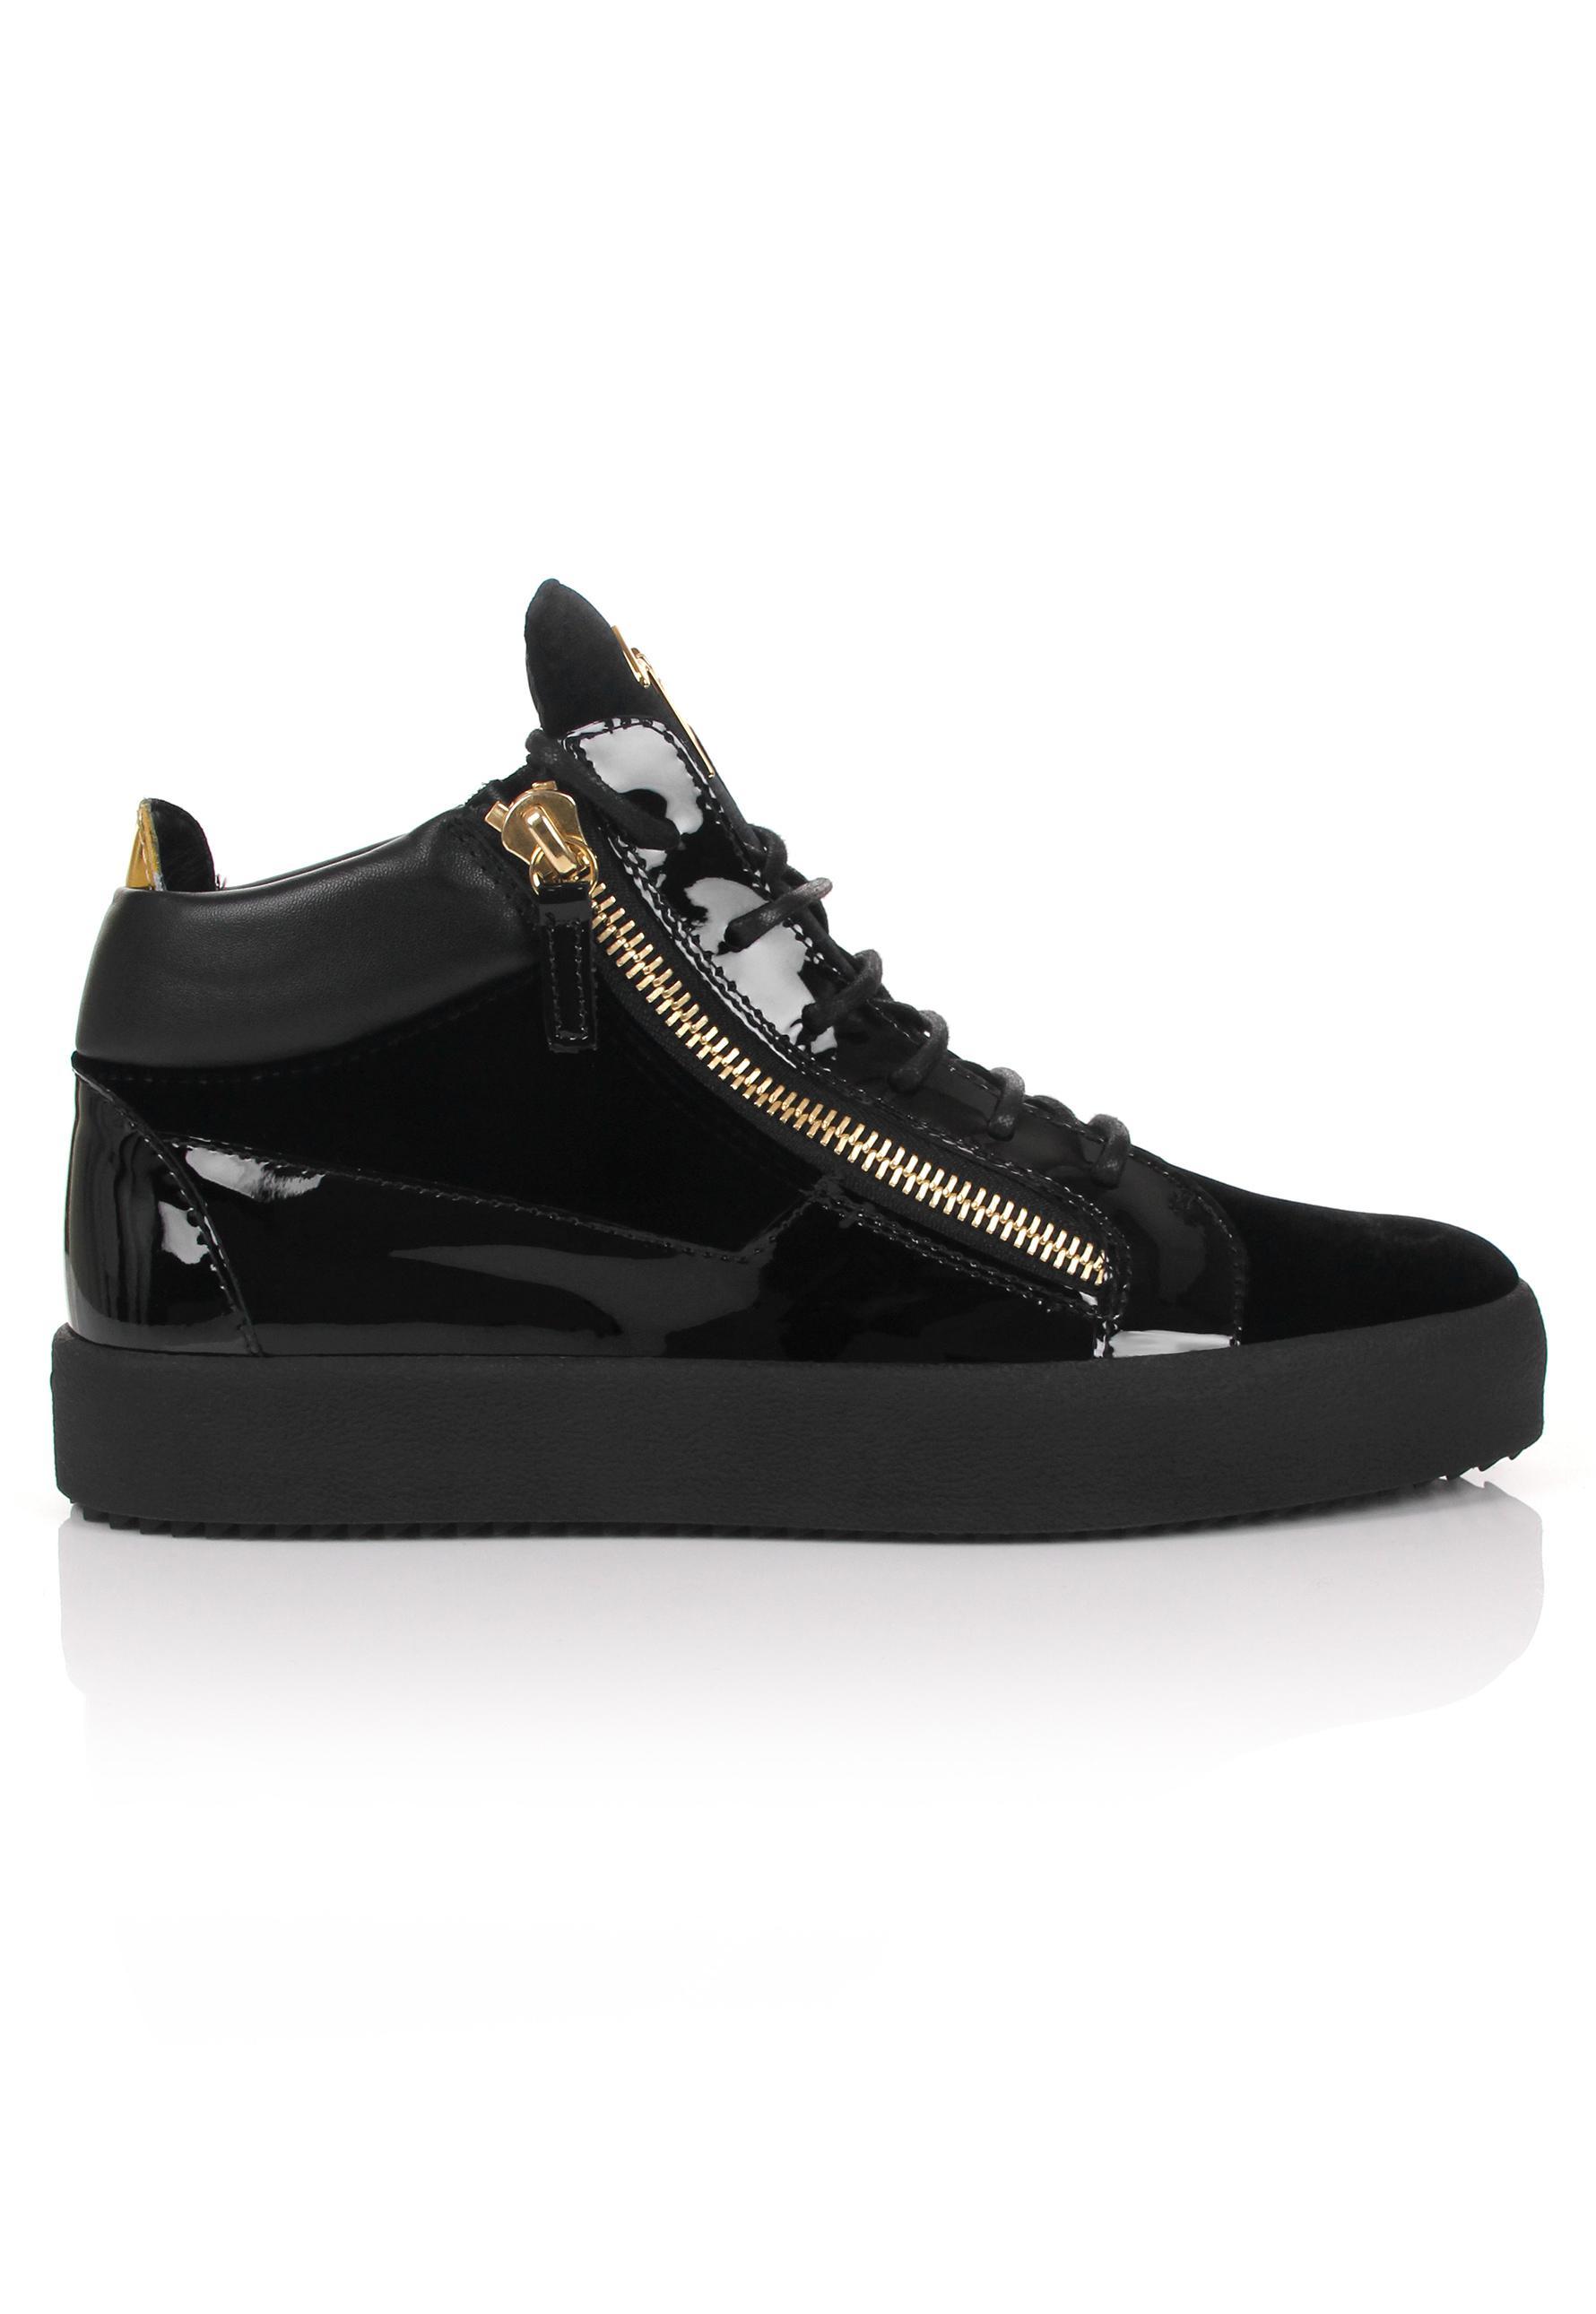 crocodile embossed Kriss sneakers - Black Giuseppe Zanotti rxvwKMQb